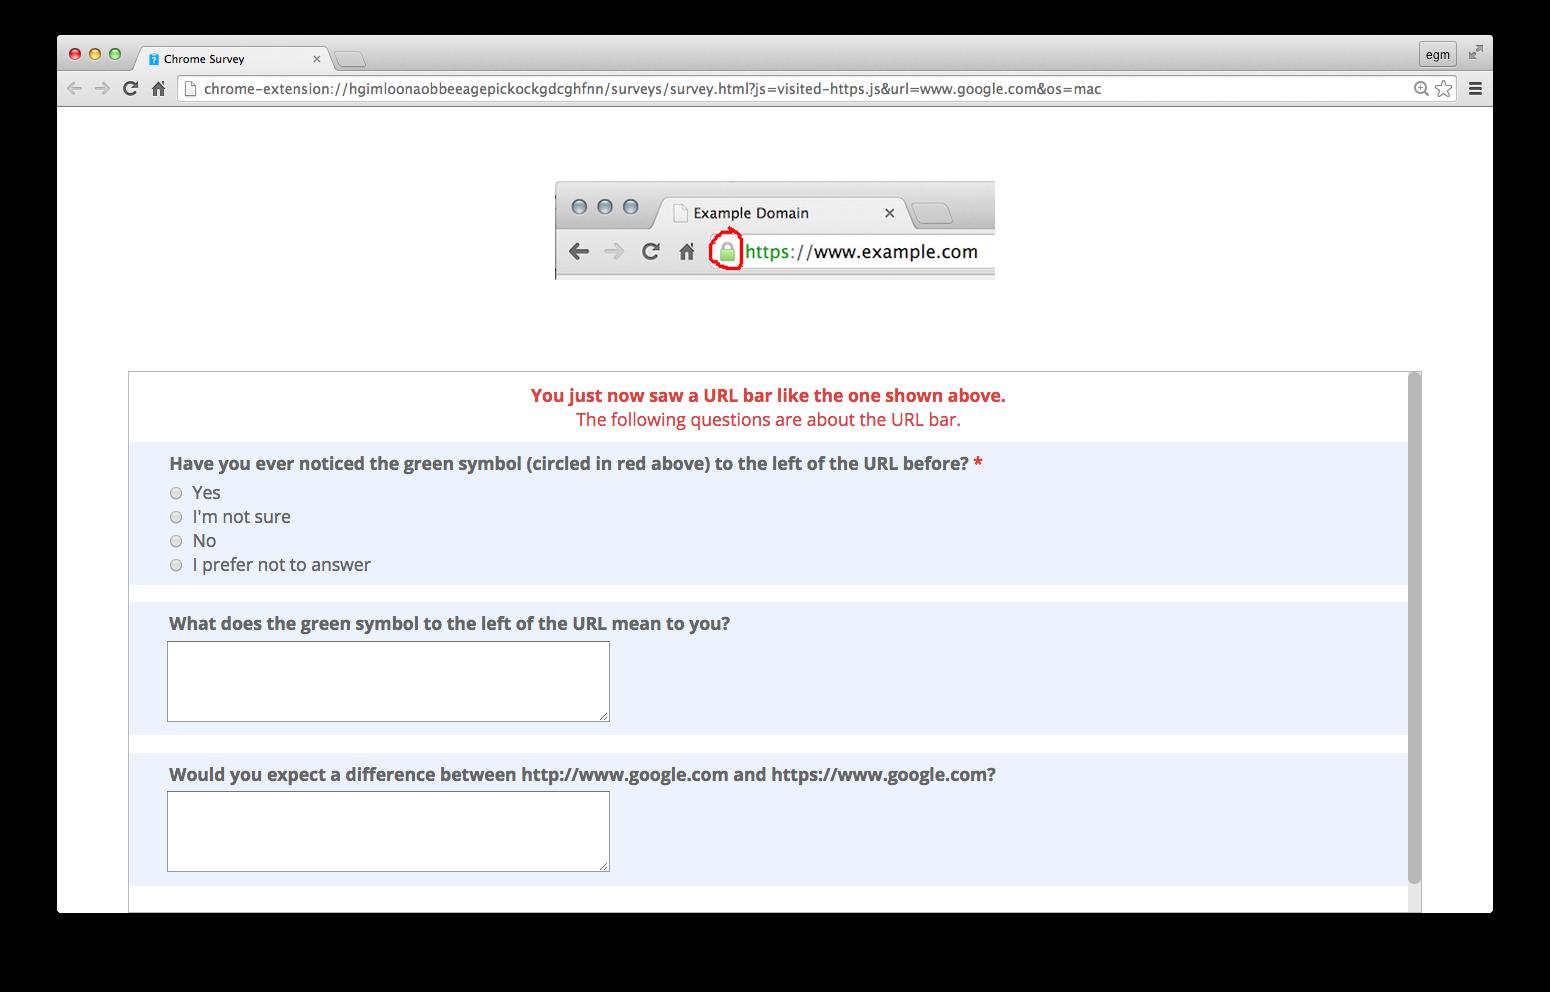 chrome_survey_example